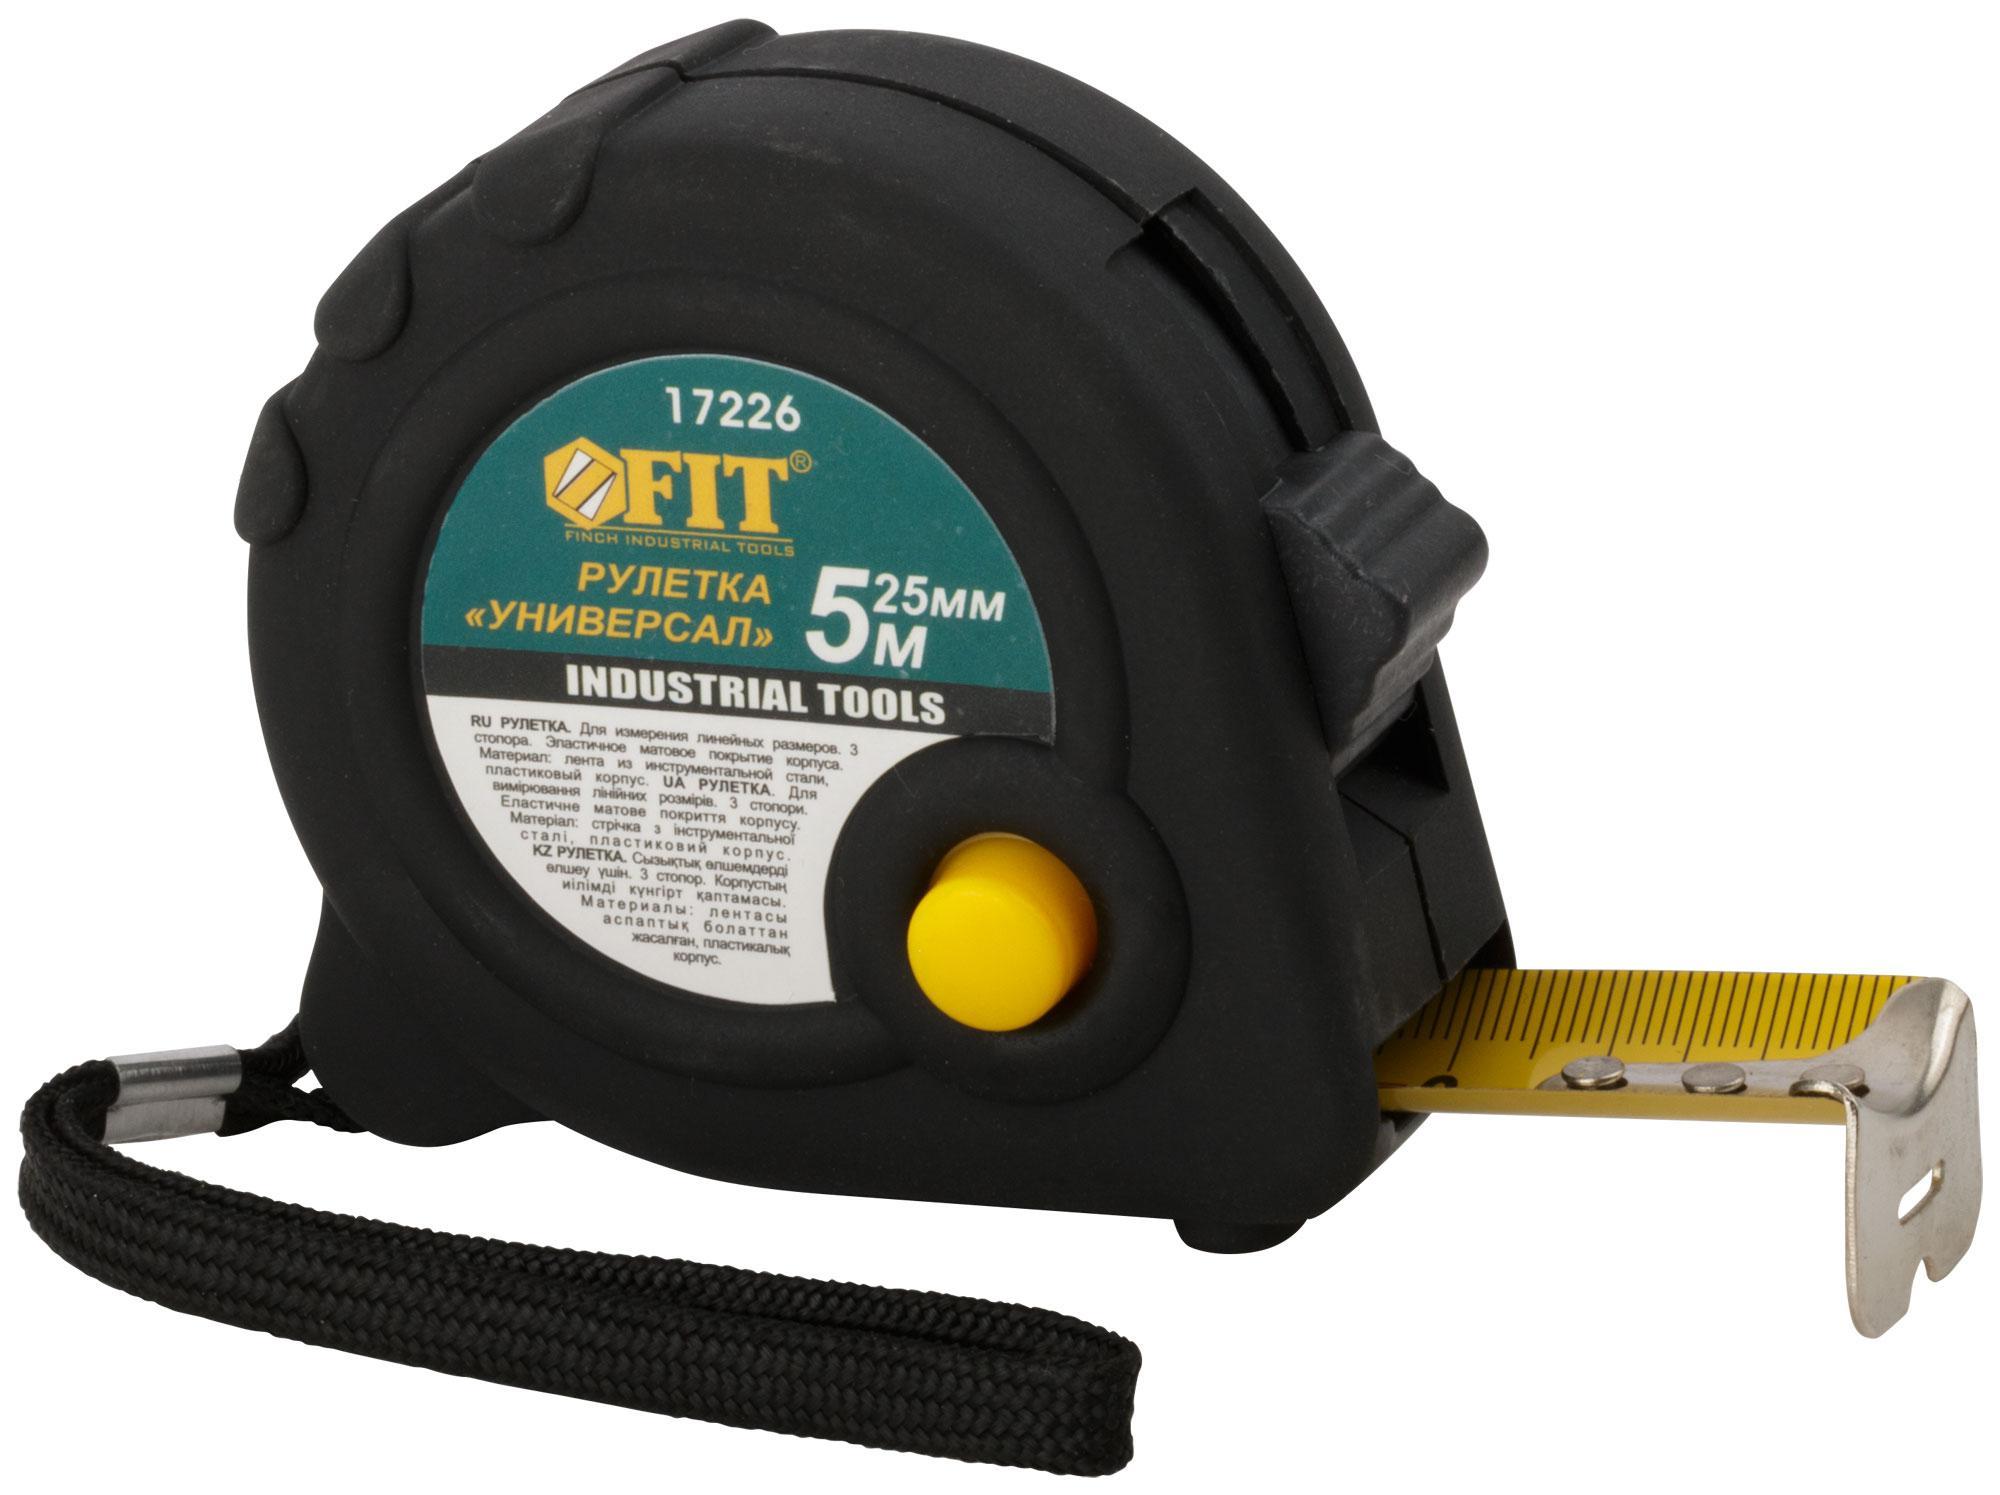 Рулетка Fit 17226 рулетка fit 17602